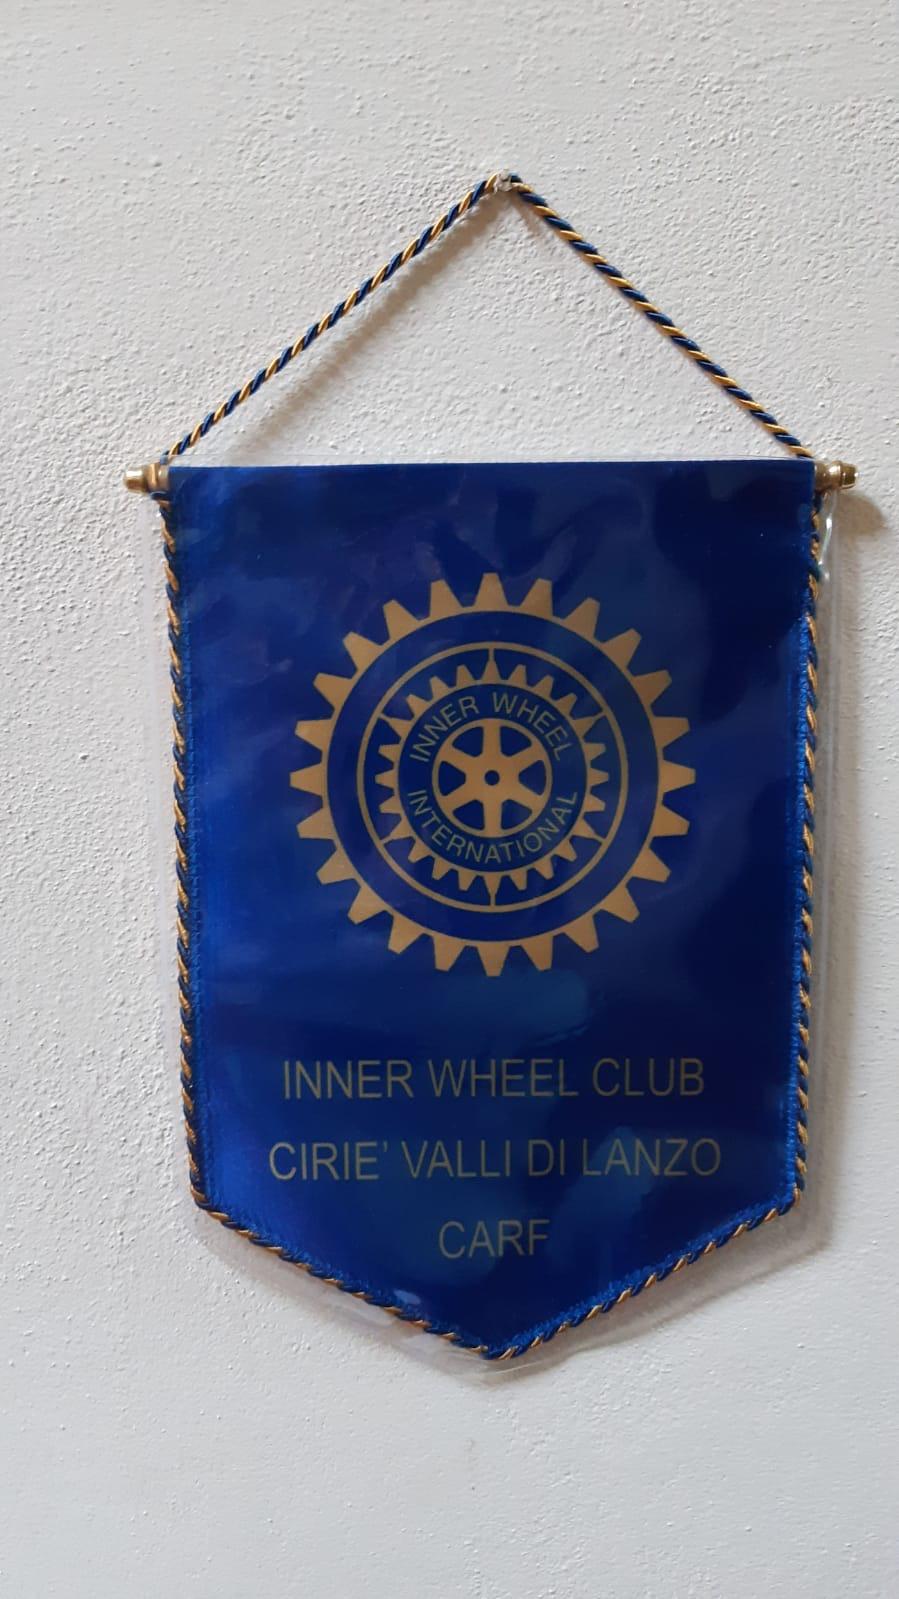 IN PUNTA DI CUORE RINGRAZIA INNER WHEEL CLUB